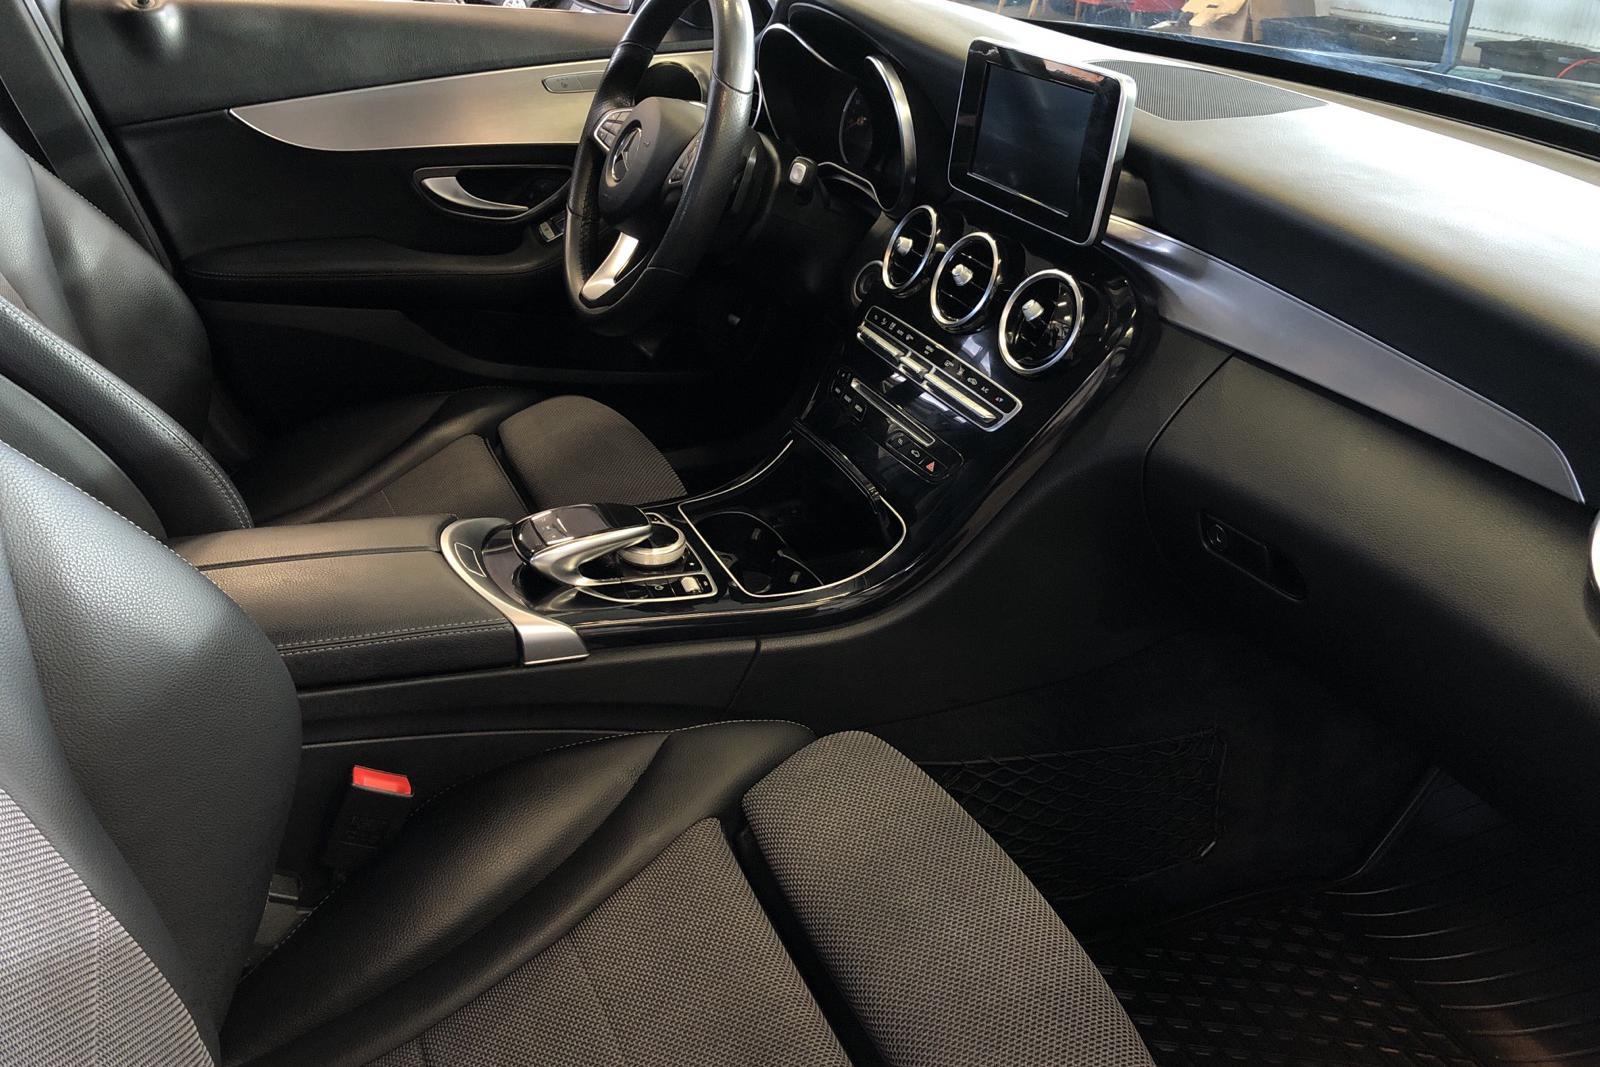 Mercedes C 220 d 4MATIC Kombi S205 (170hk) - 199 520 km - Automatic - black - 2018